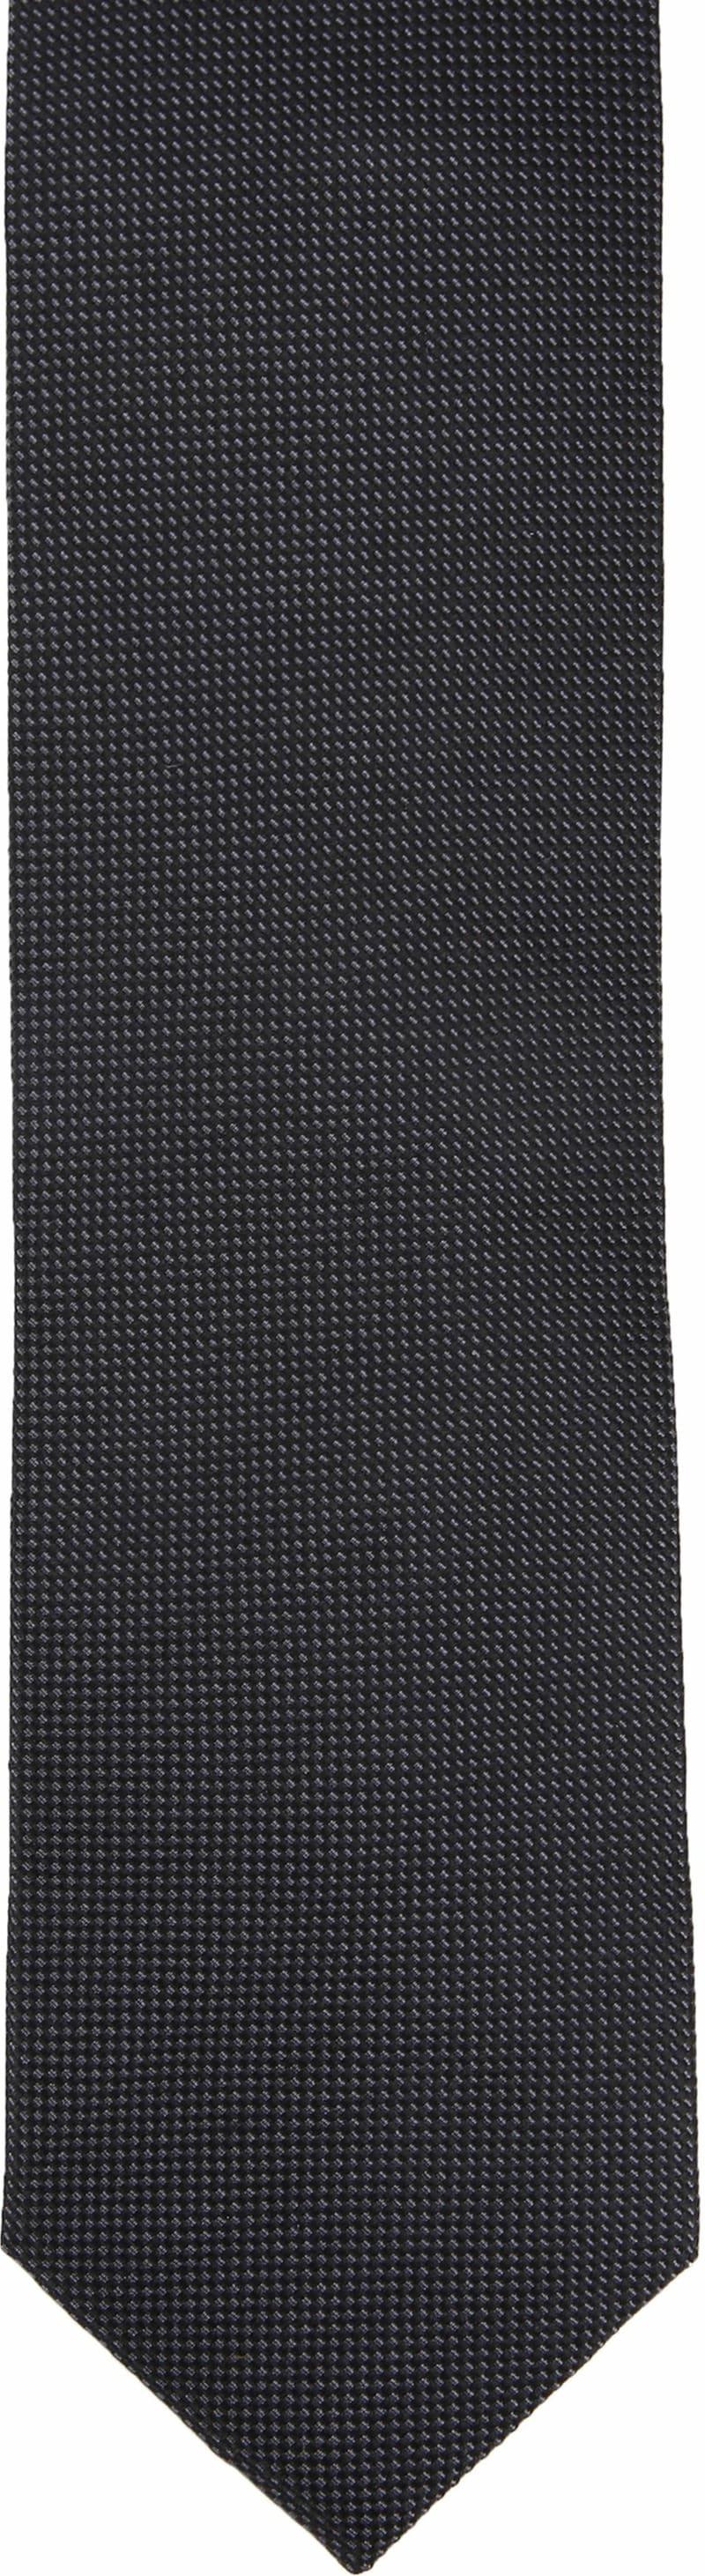 Suitable Tie Silk Black 10 photo 1